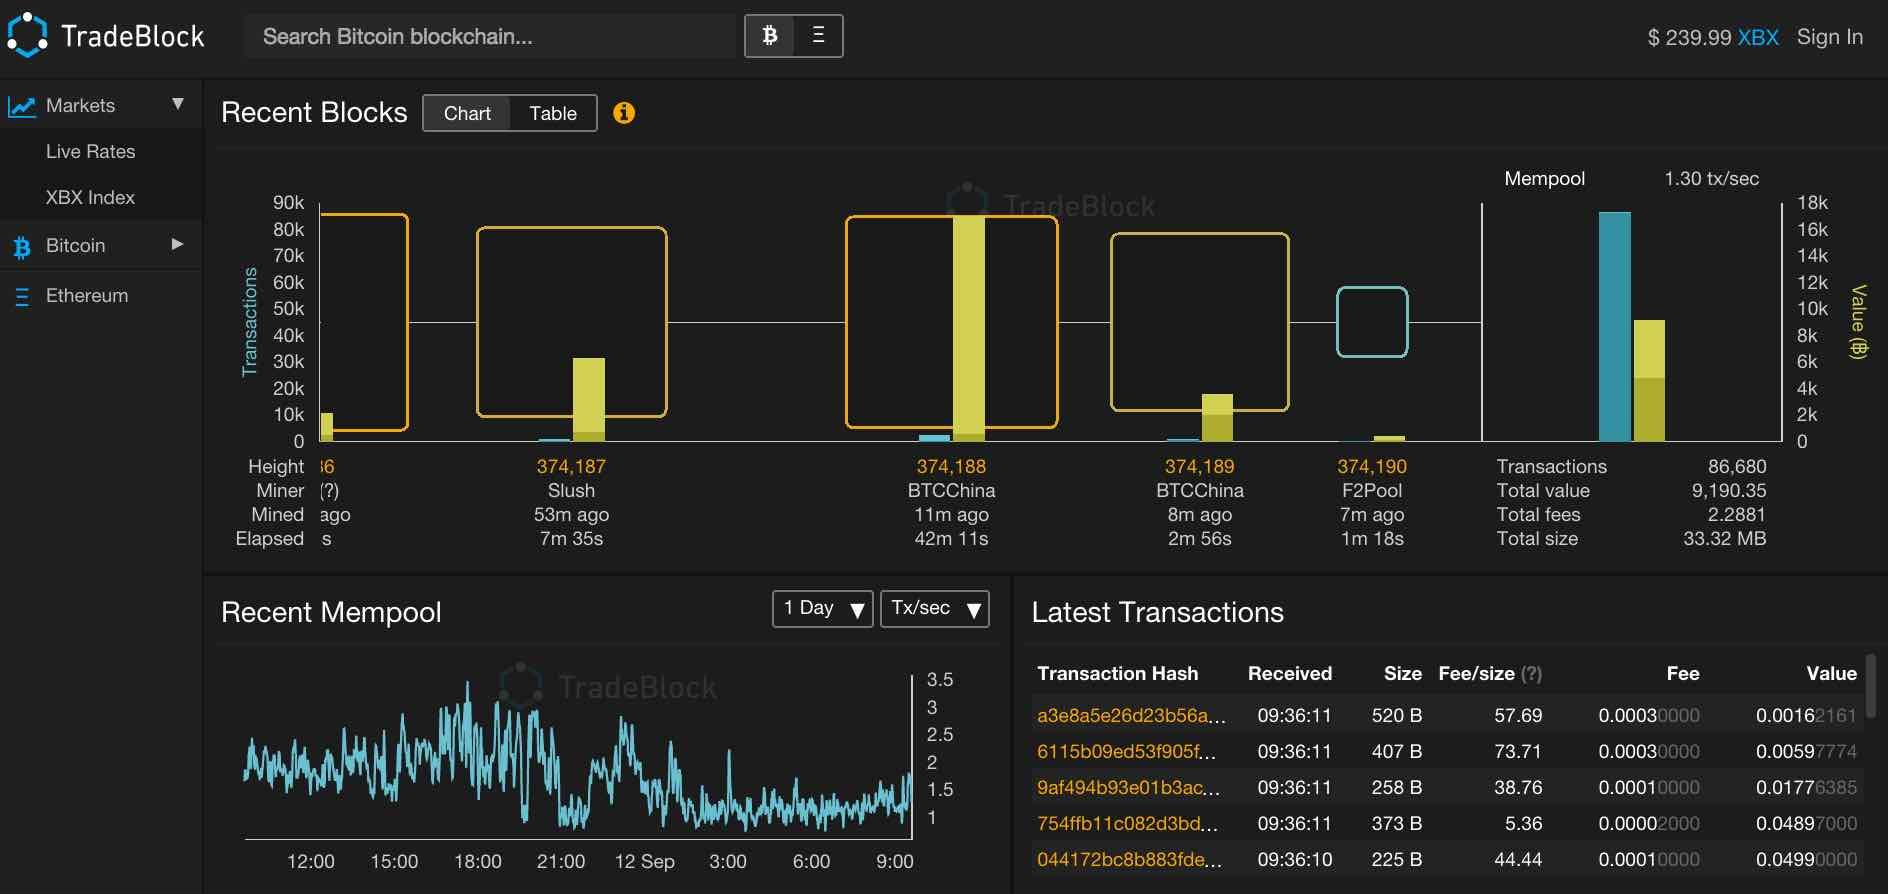 tradeblock-screenshot-diariobitcoin